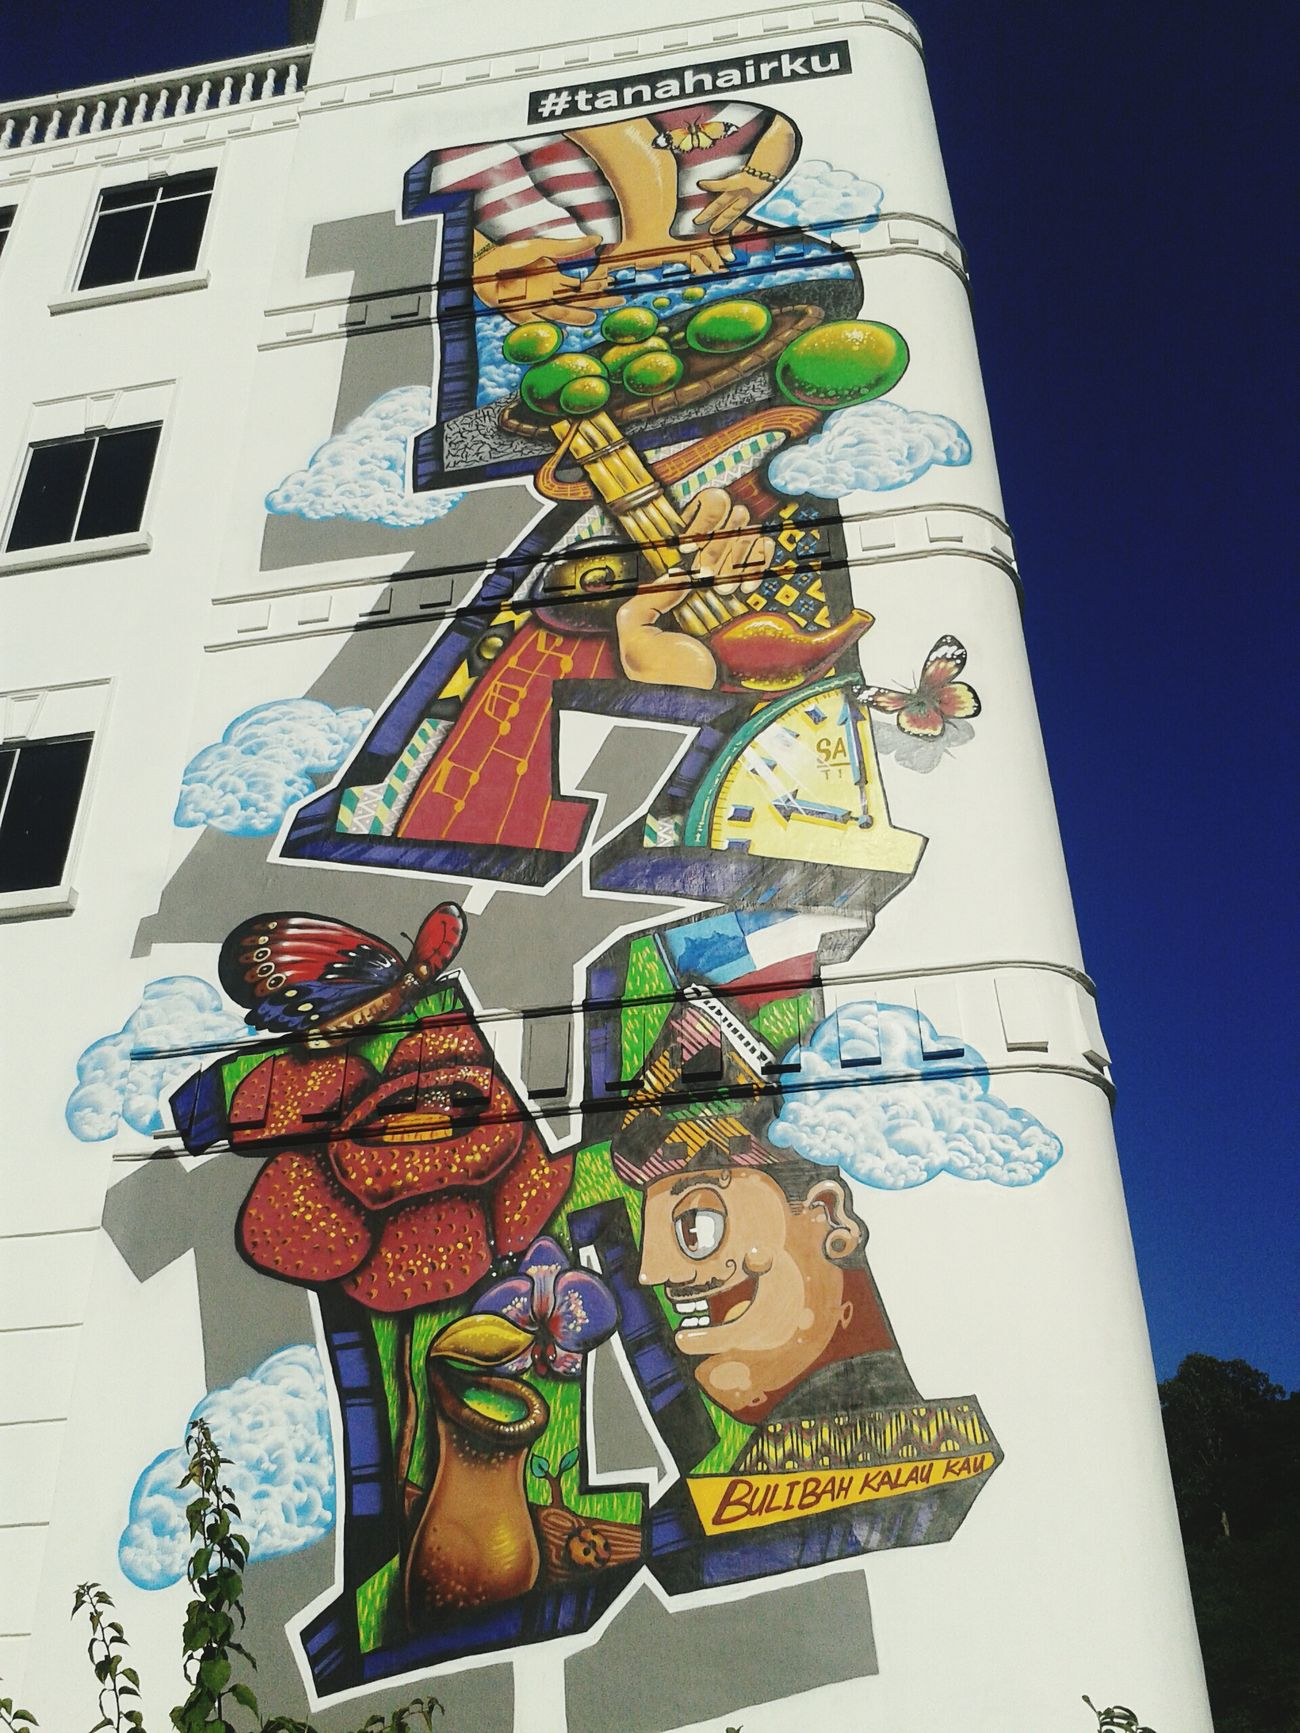 Ok bah! Mobile Photography S3mini Urban Art Building Architecture Kota Kinabalu Sabah Malaysia Graffiti Art Culture Art Culture Diversity